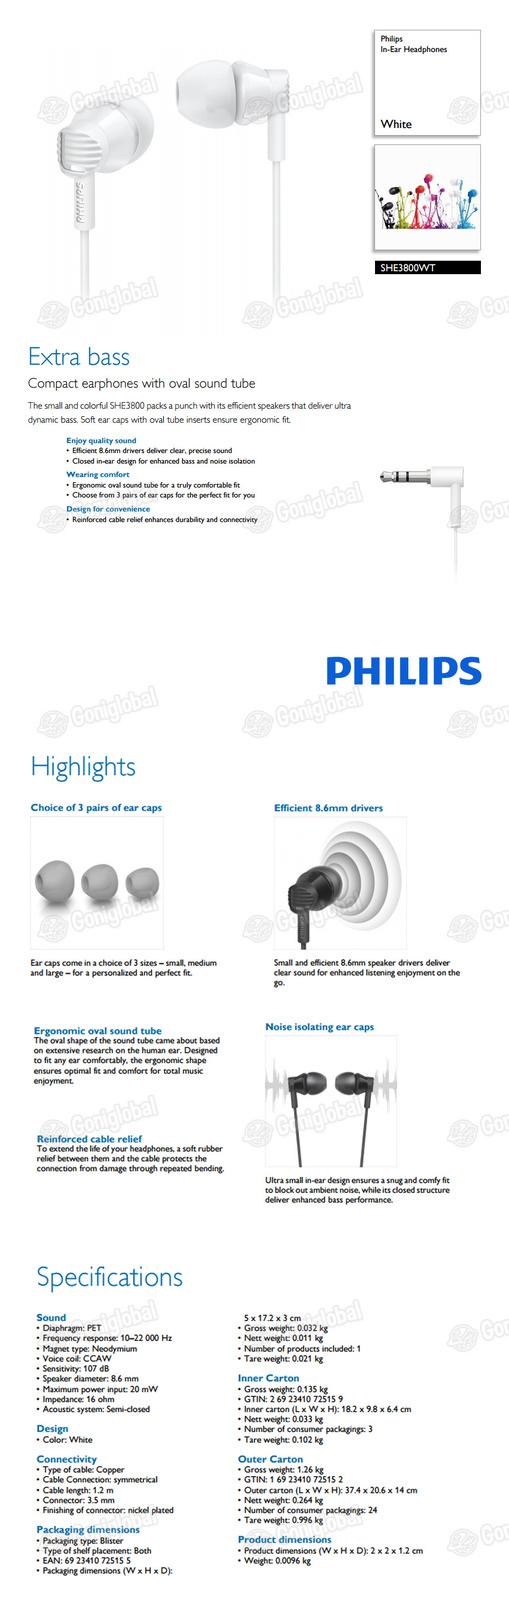 Philips she3800wt